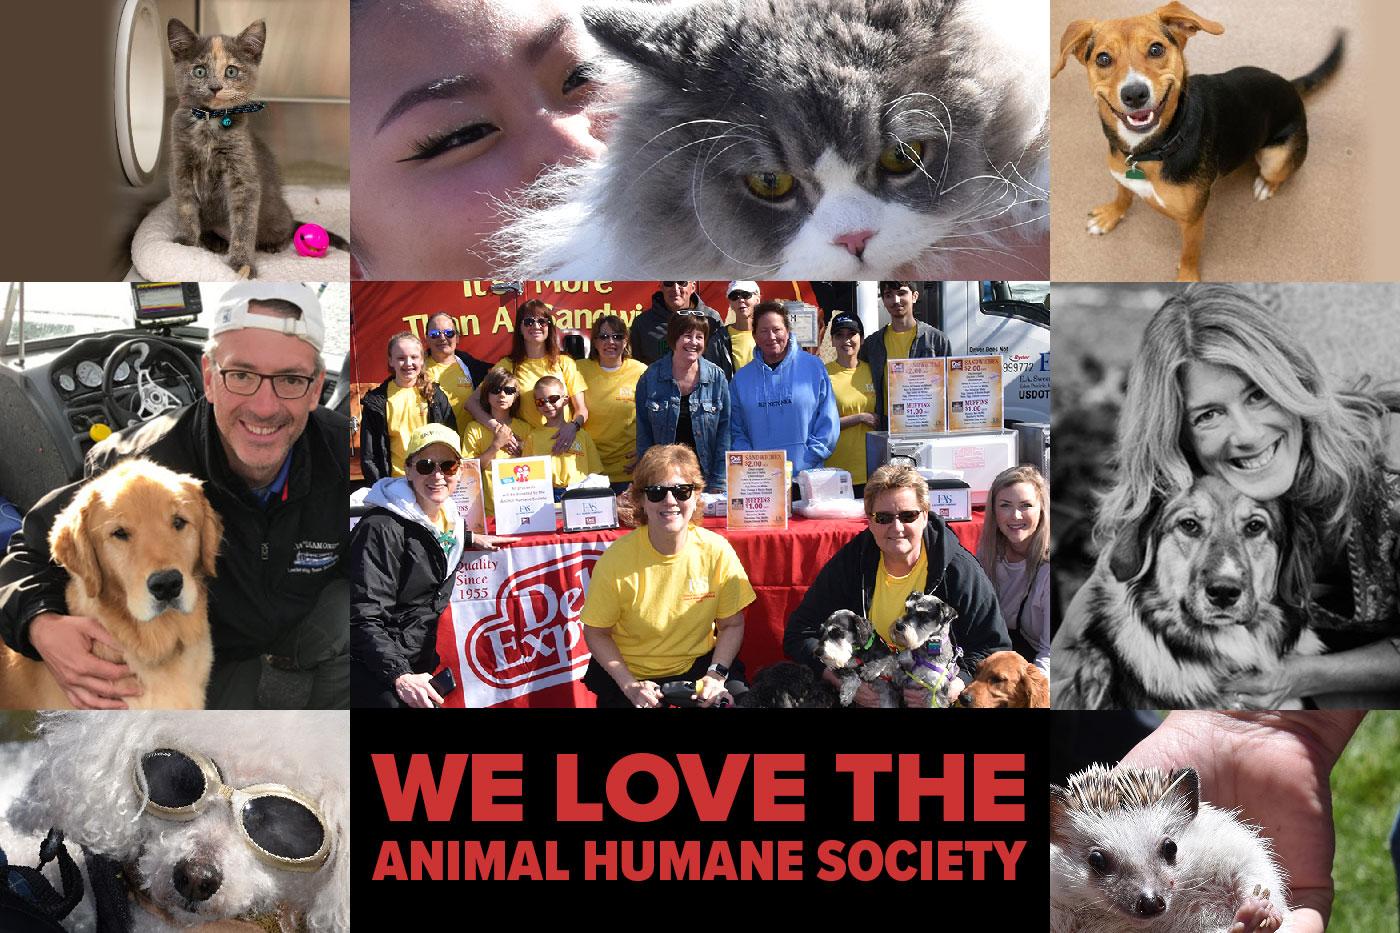 We love the Animal Humane Society image